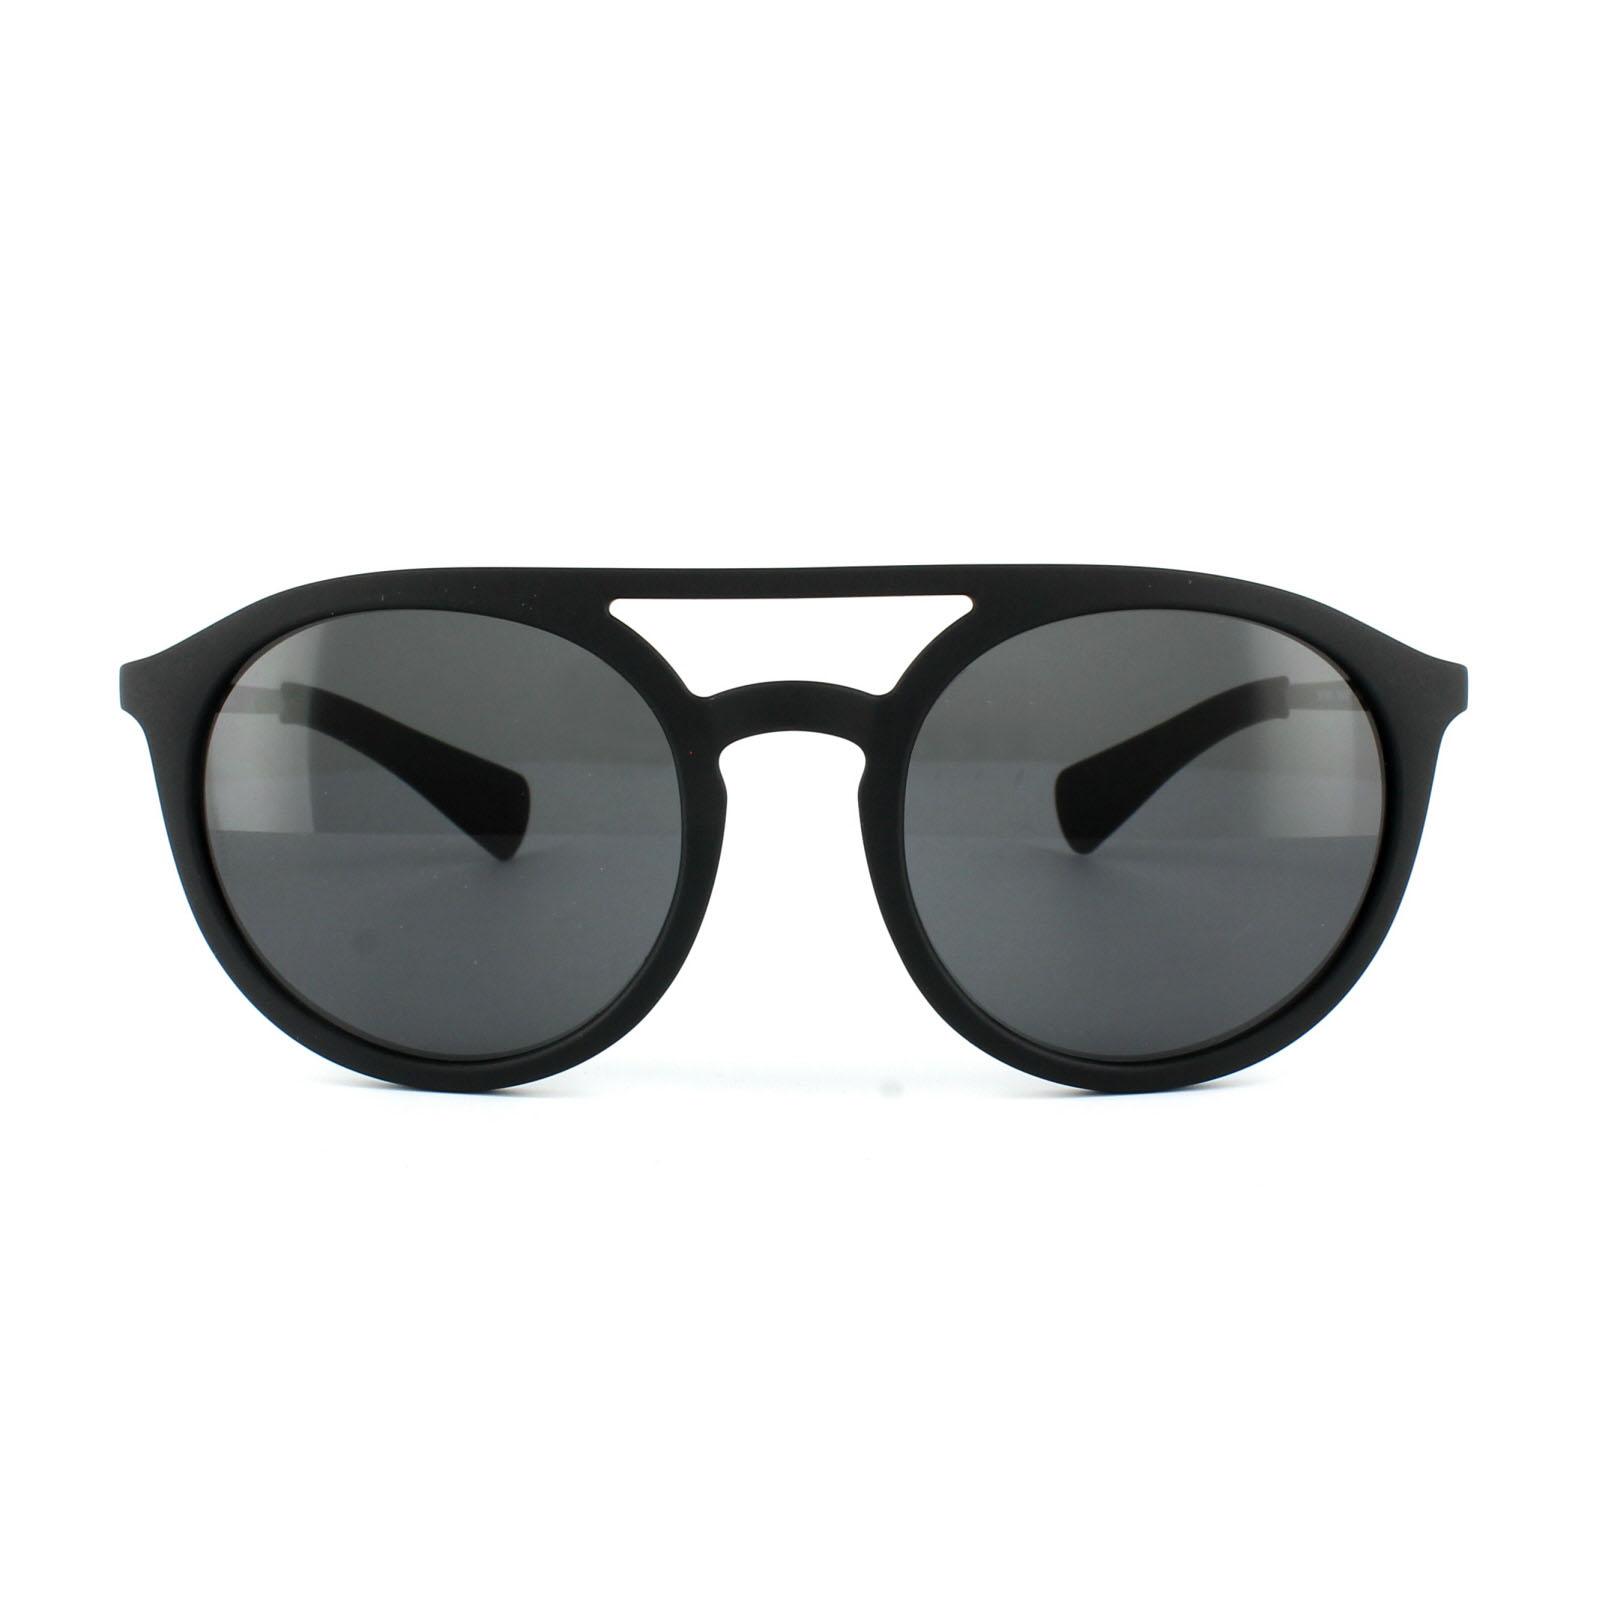 Dolce Gabbana Sunglasses Black  dolce gabbana sunglasses 6101 1934 87 matt black grey ebay